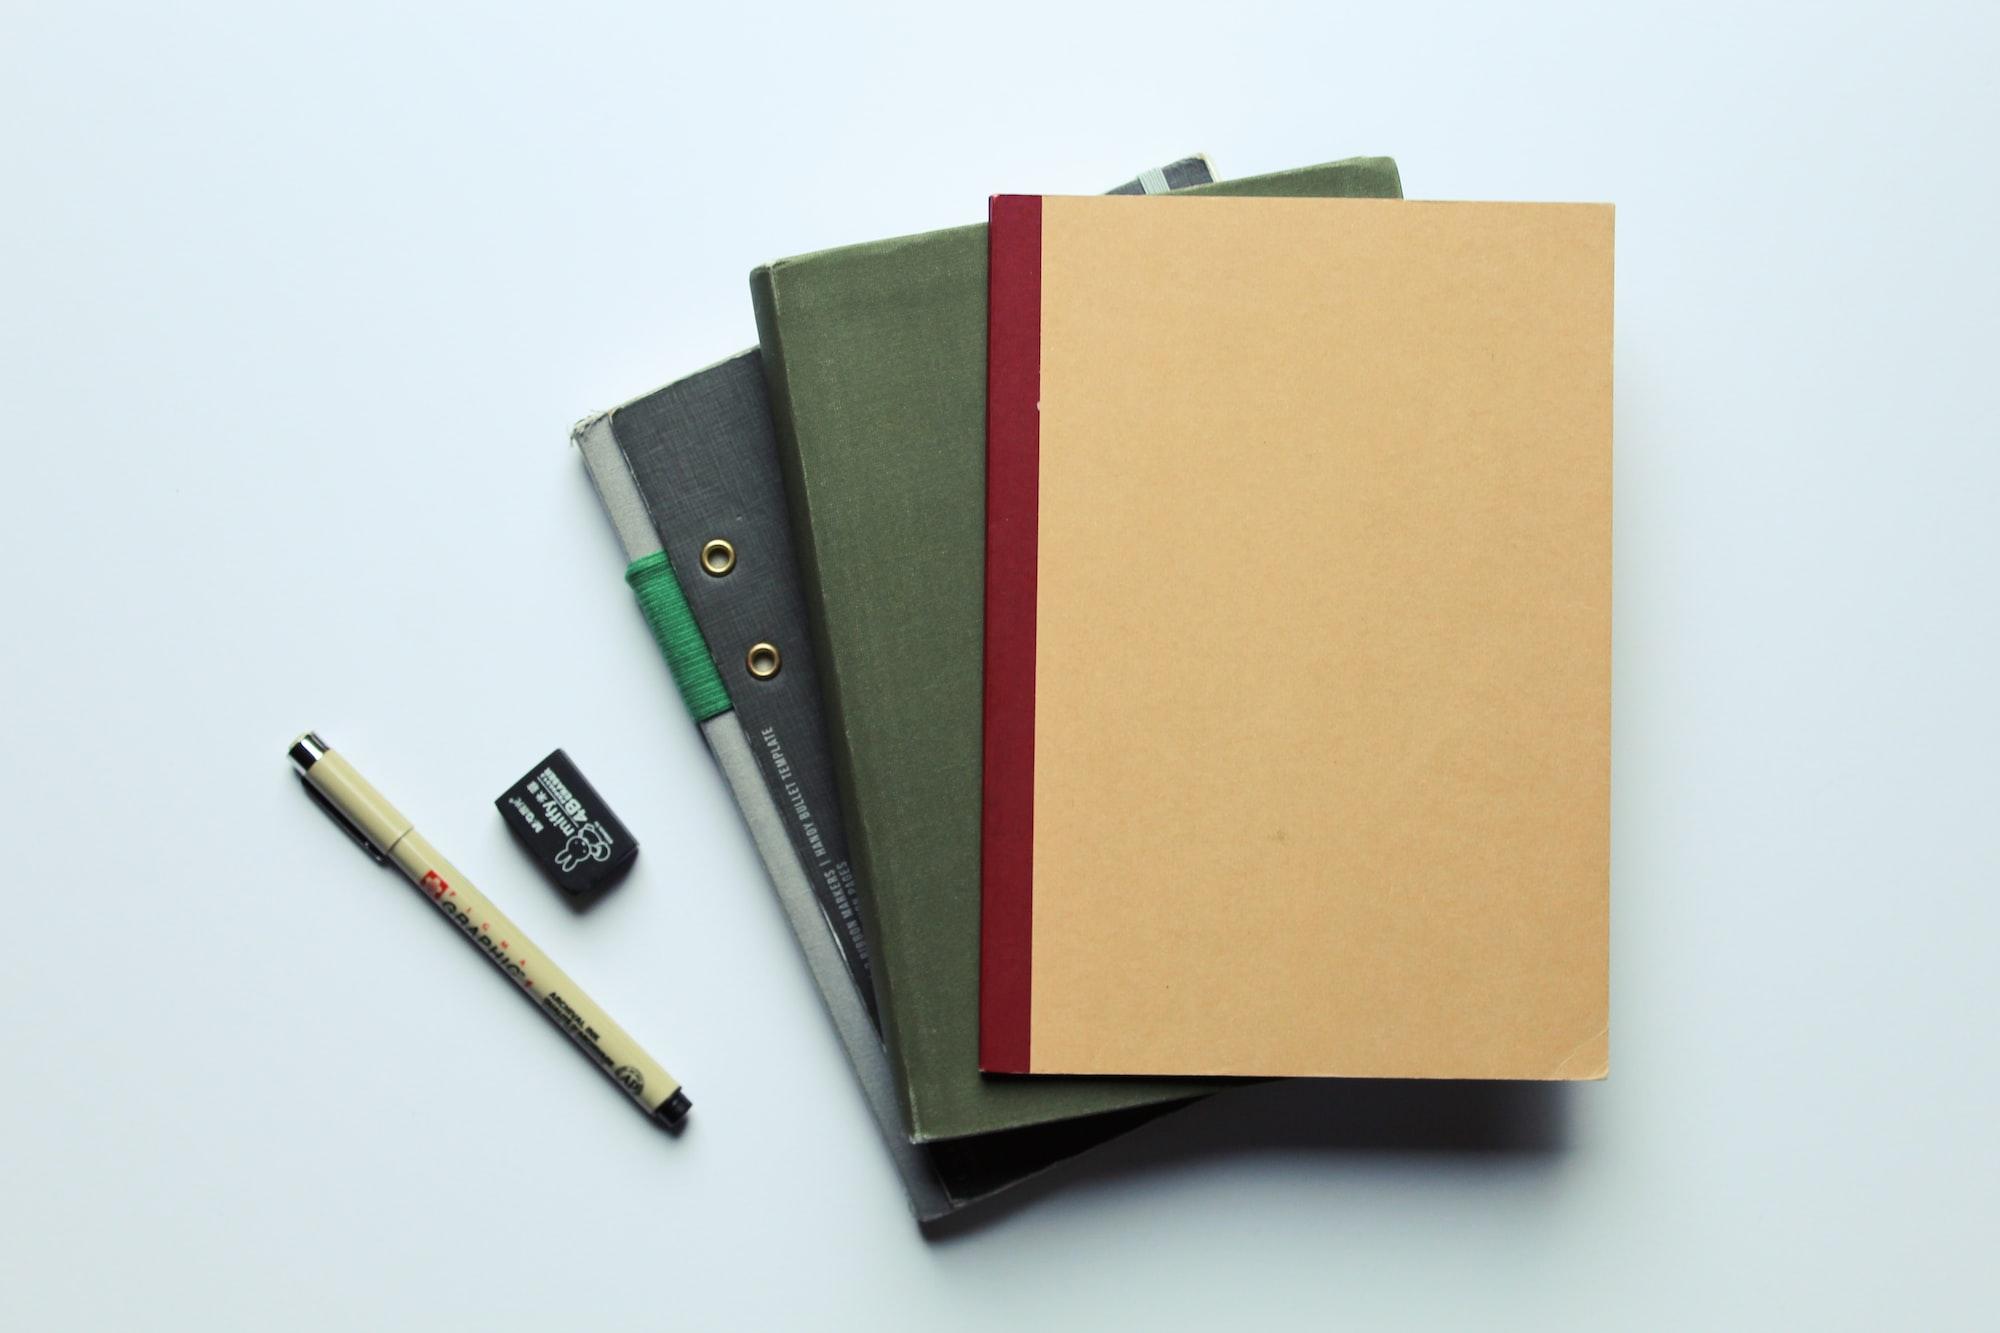 August 19: Folder Upload